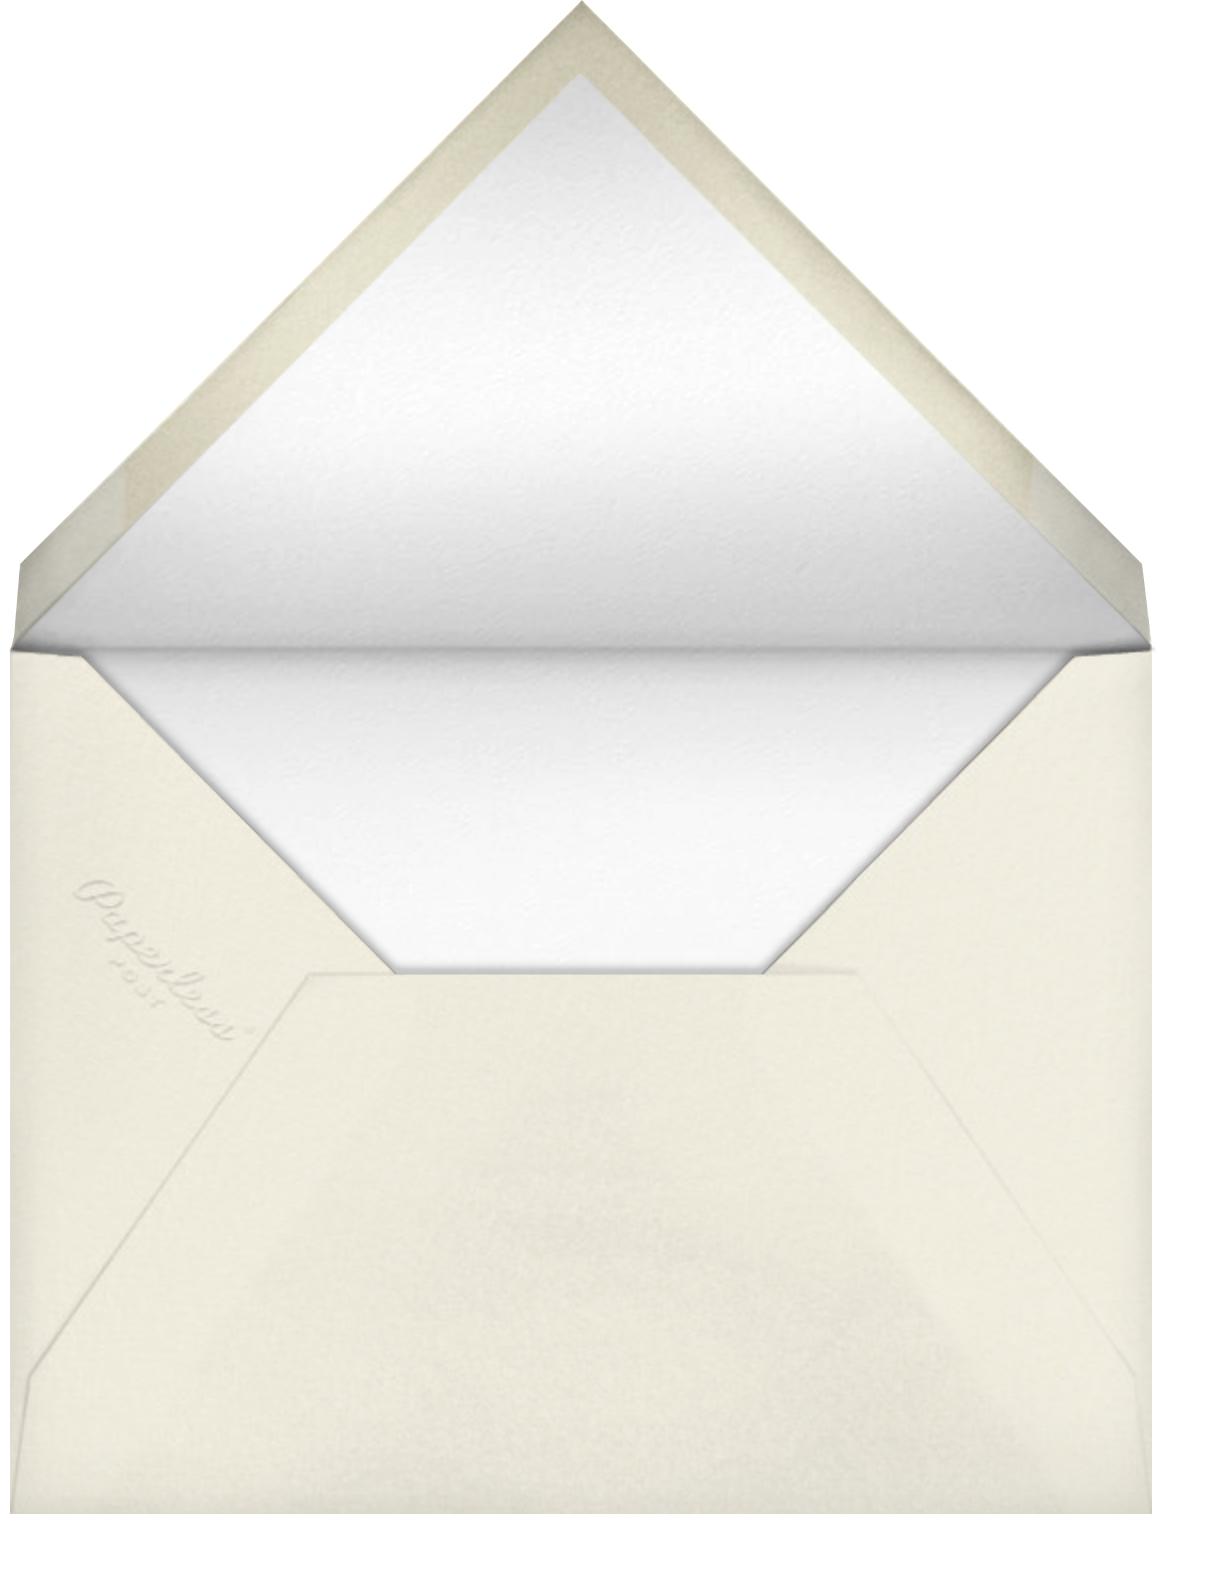 My Birthday, My Imbibing - Derek Blasberg - null - envelope back